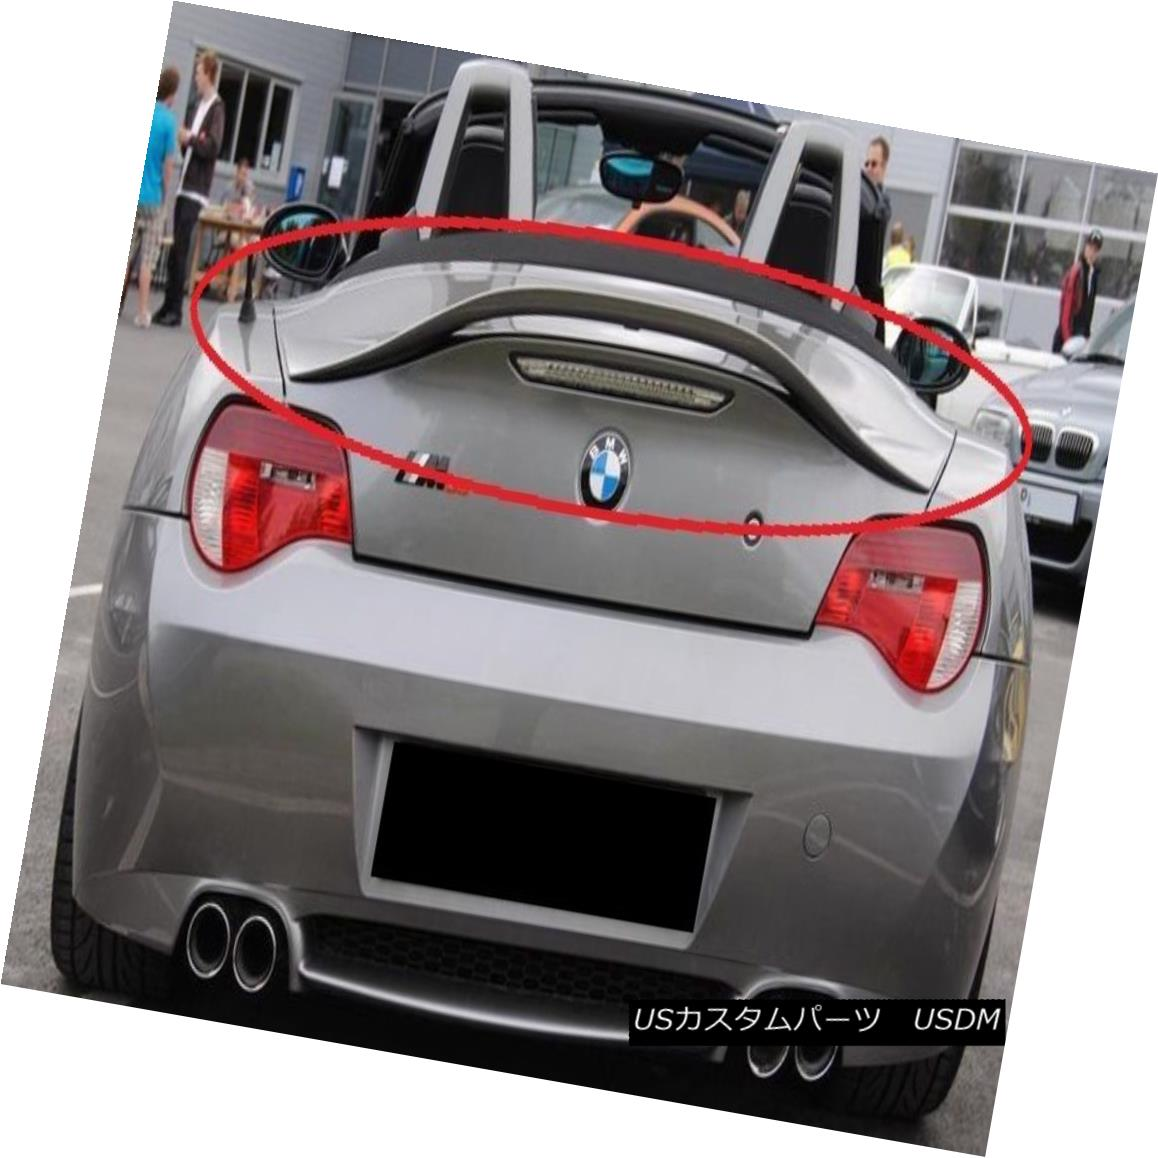 a10a21321fb9 エアロパーツ BMW Z4 オンライン E85 2002 - 2008 REAR BOOT TRUNK SPOILER NEW TAILGATE  AERO BMW Z4 E85 2002 - 2008リア・ブーツ・トランク・スポイラーNEW ...